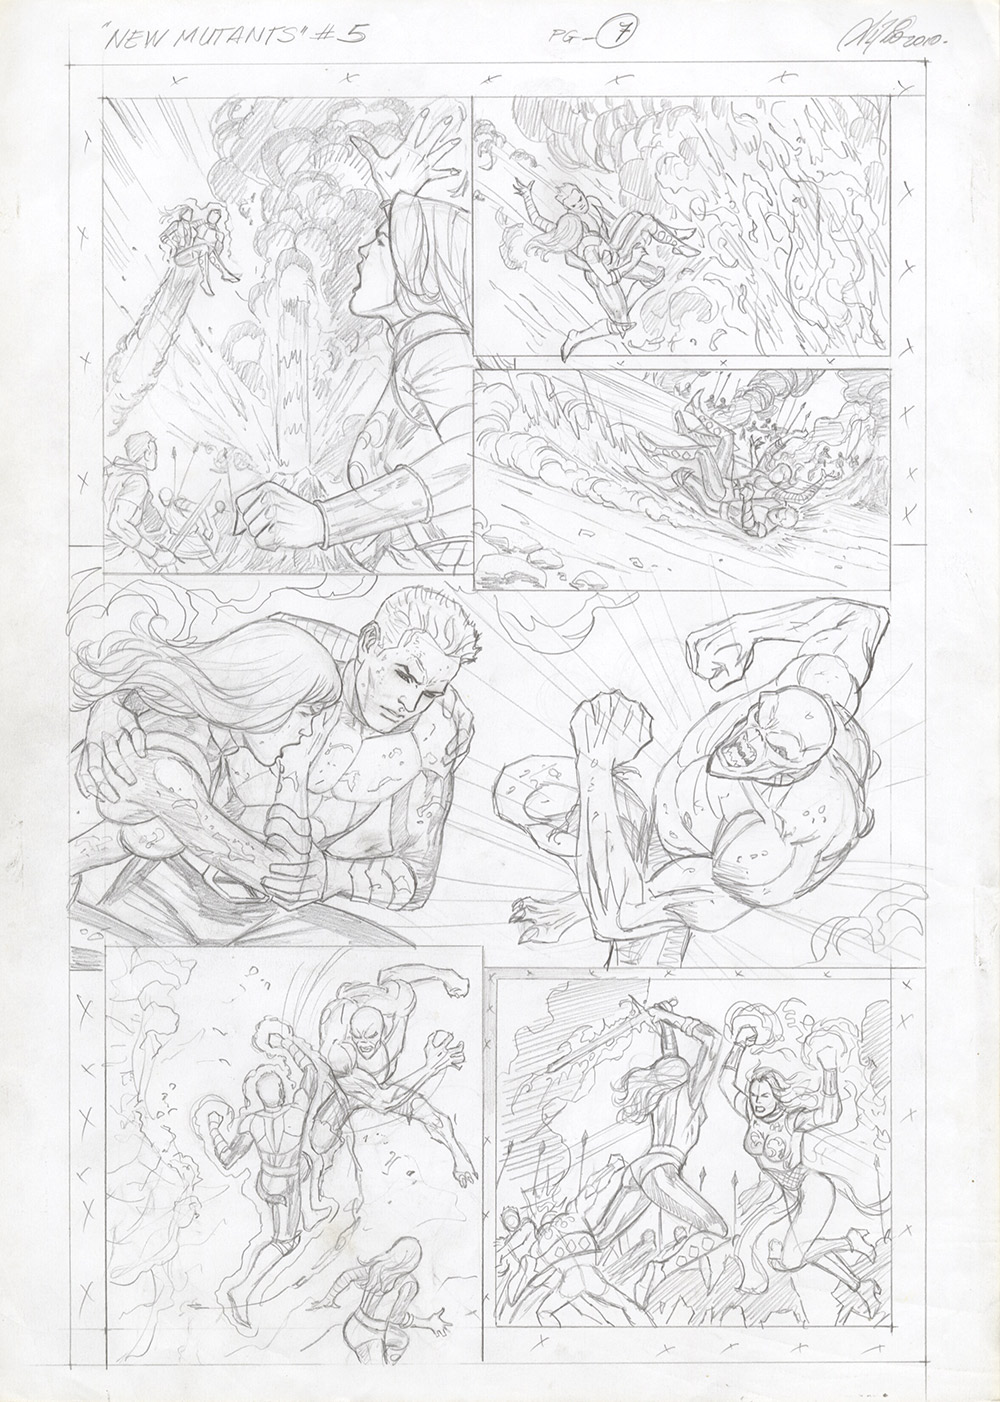 New Mutants #5, Page 7 - Original Comic Art prelim page by Al Rio